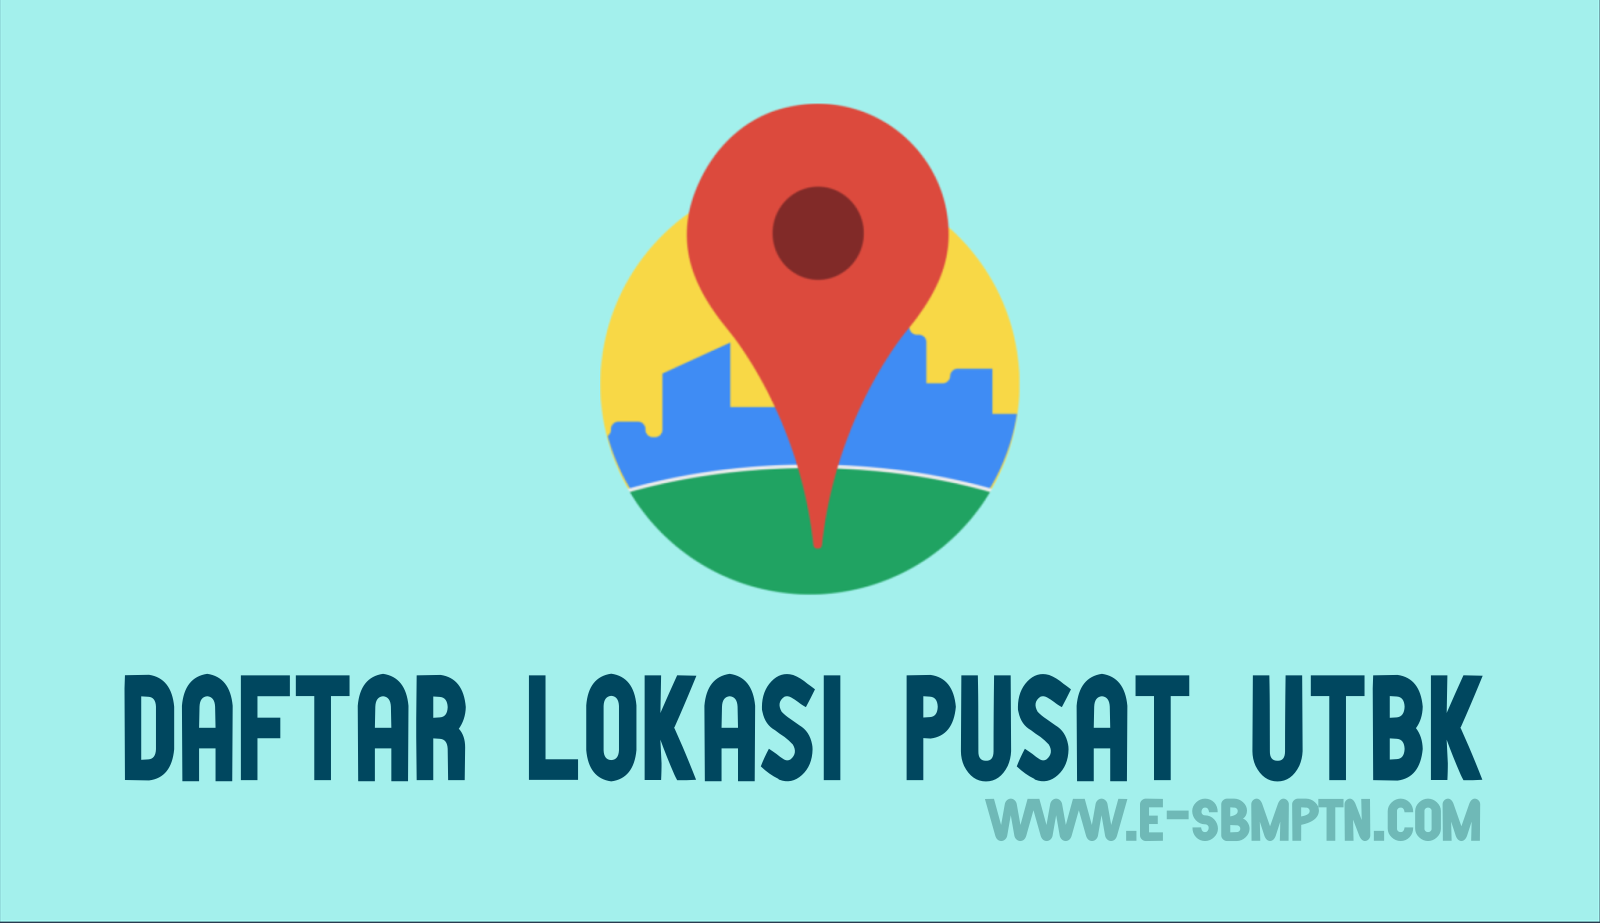 Daftar Lokasi Panitia Pusat UTBK.png